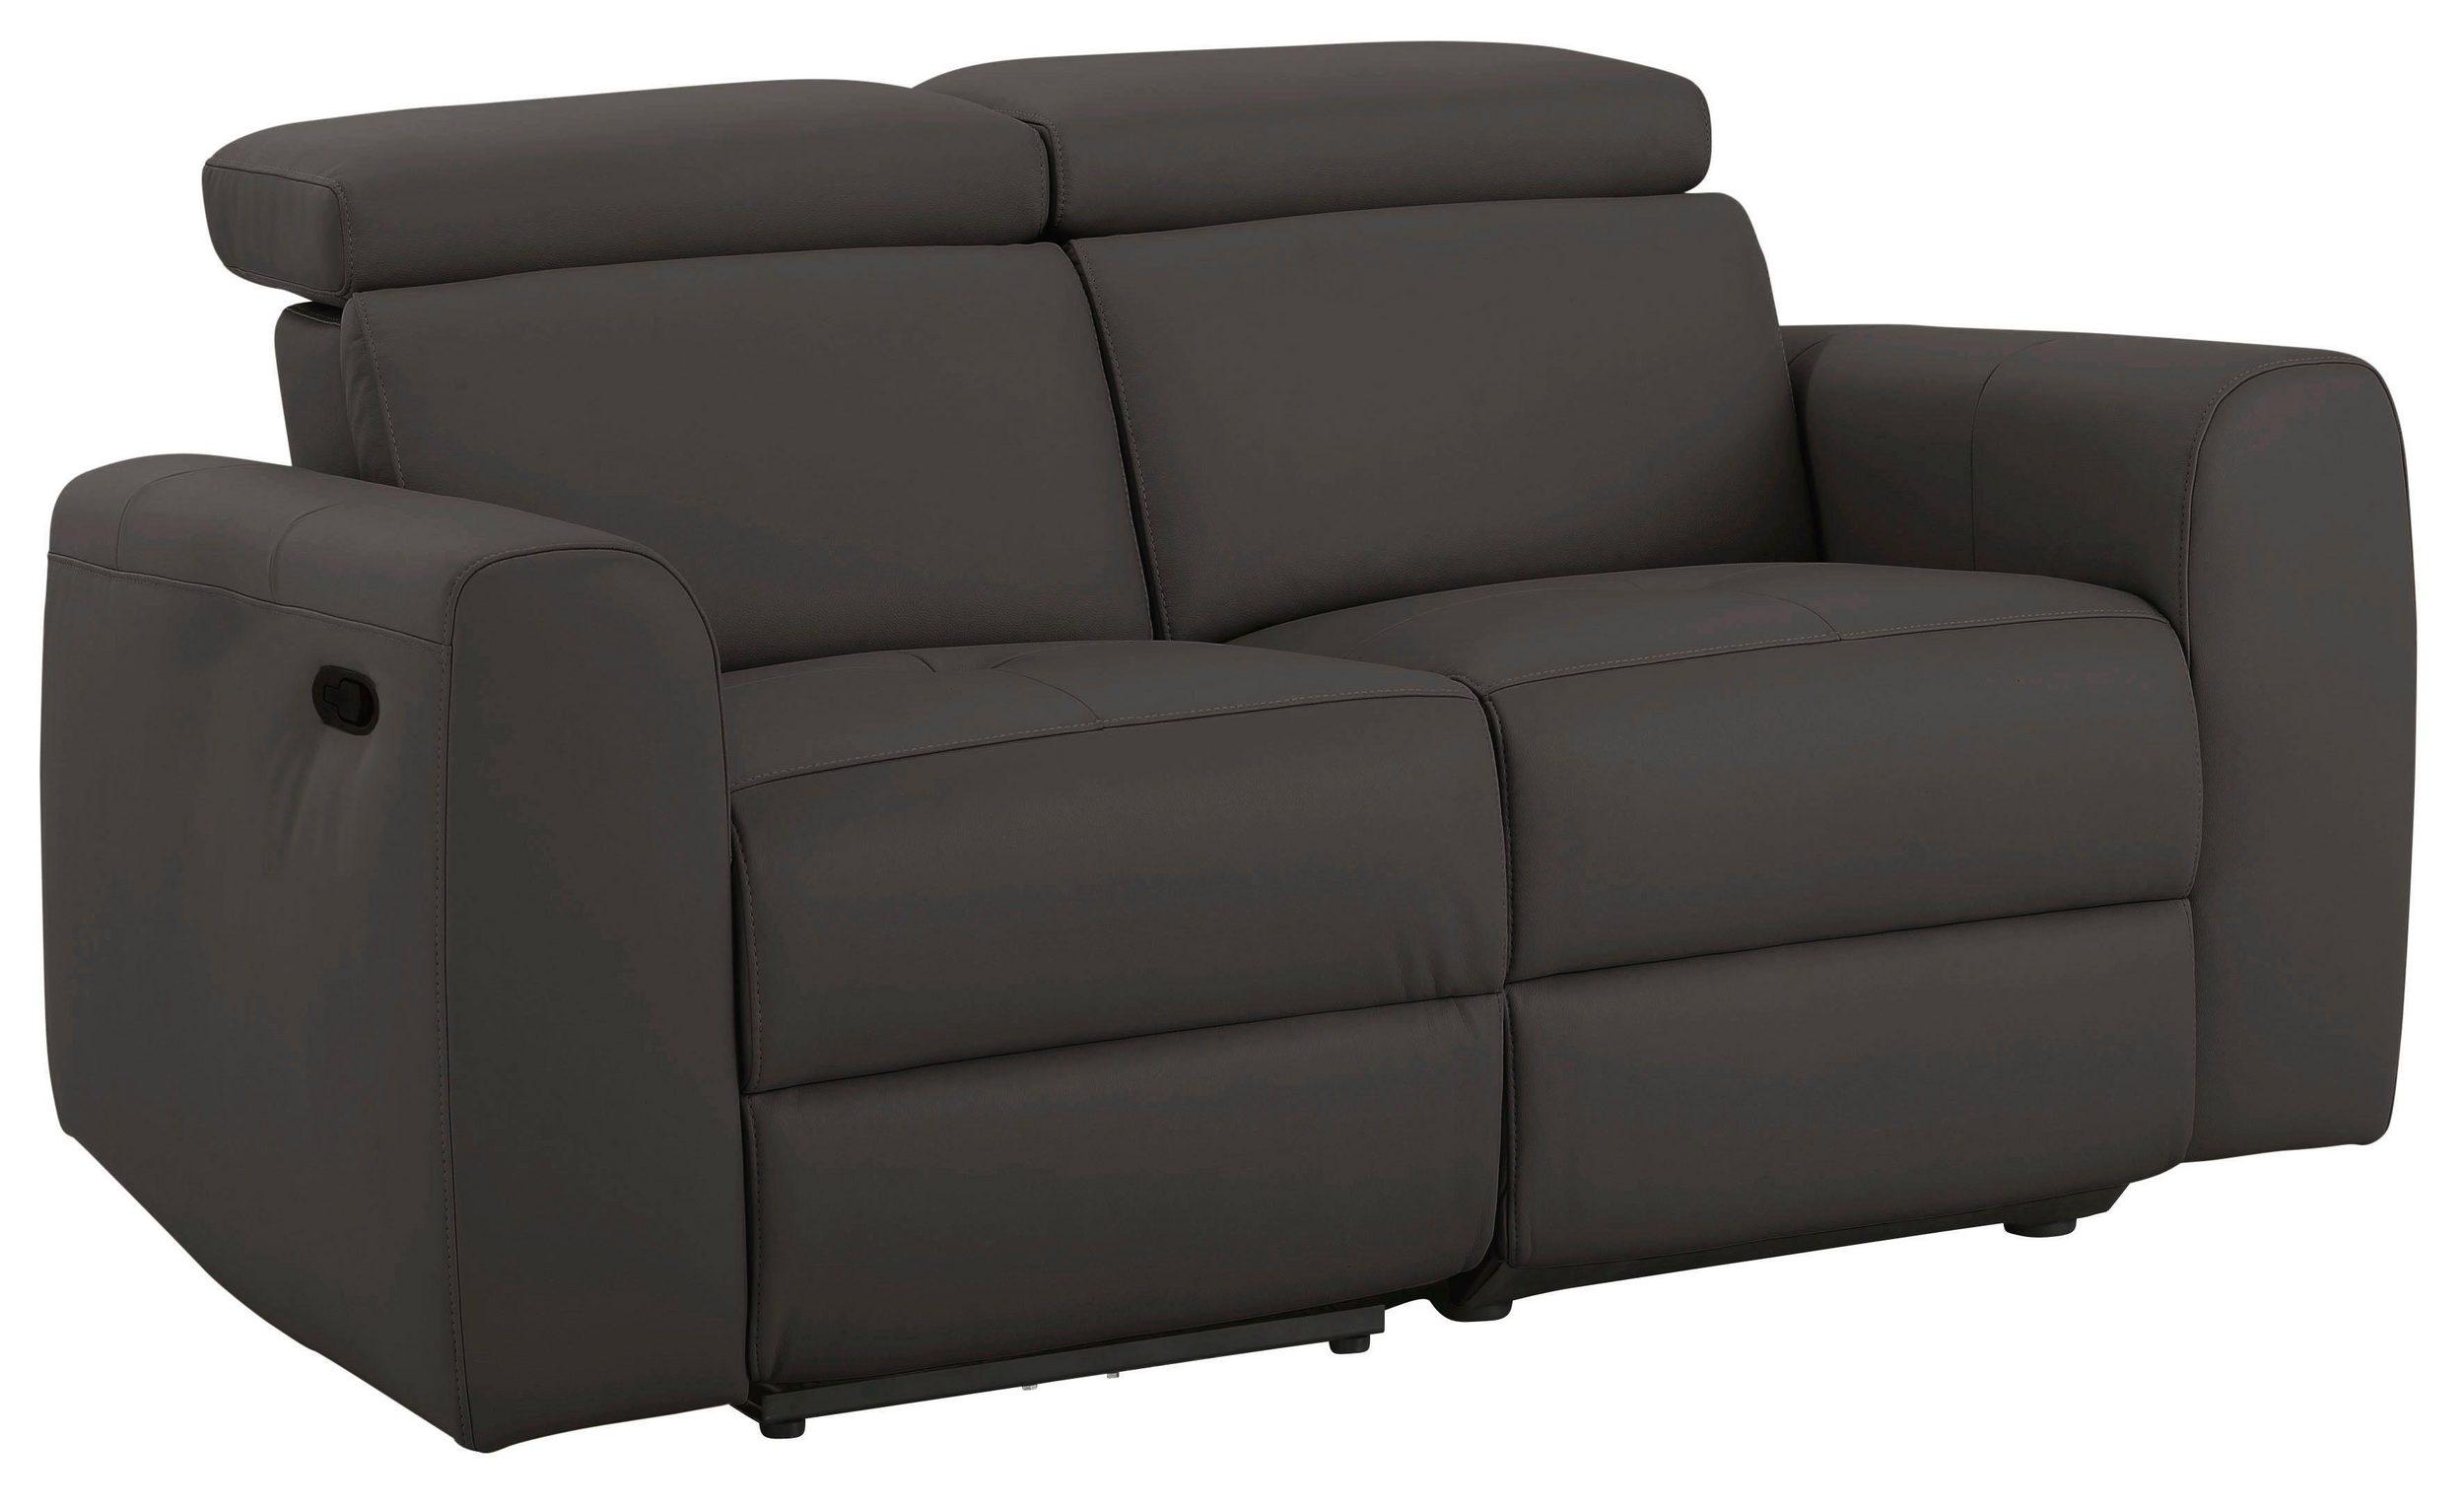 2-Sitzer Sofa Sentrano mit Relaxfunktion